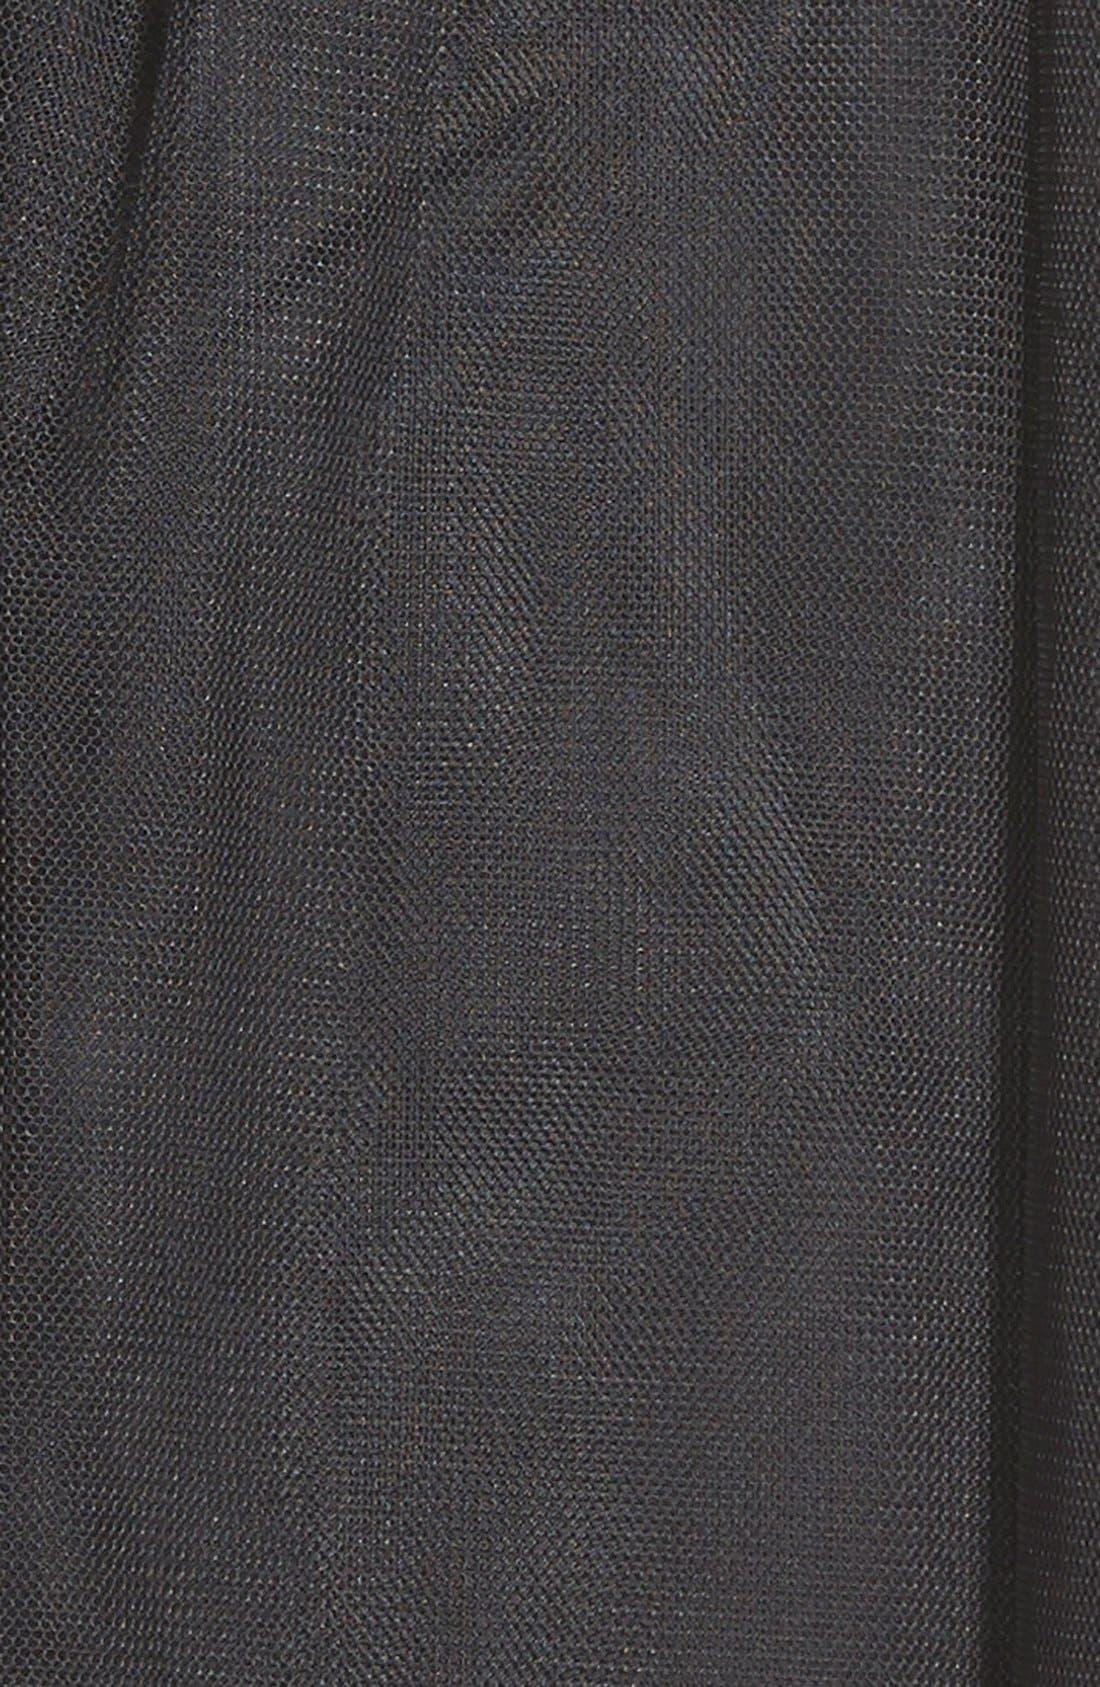 Alternate Image 3  - Sequin Hearts Sequin Lace Skater Dress